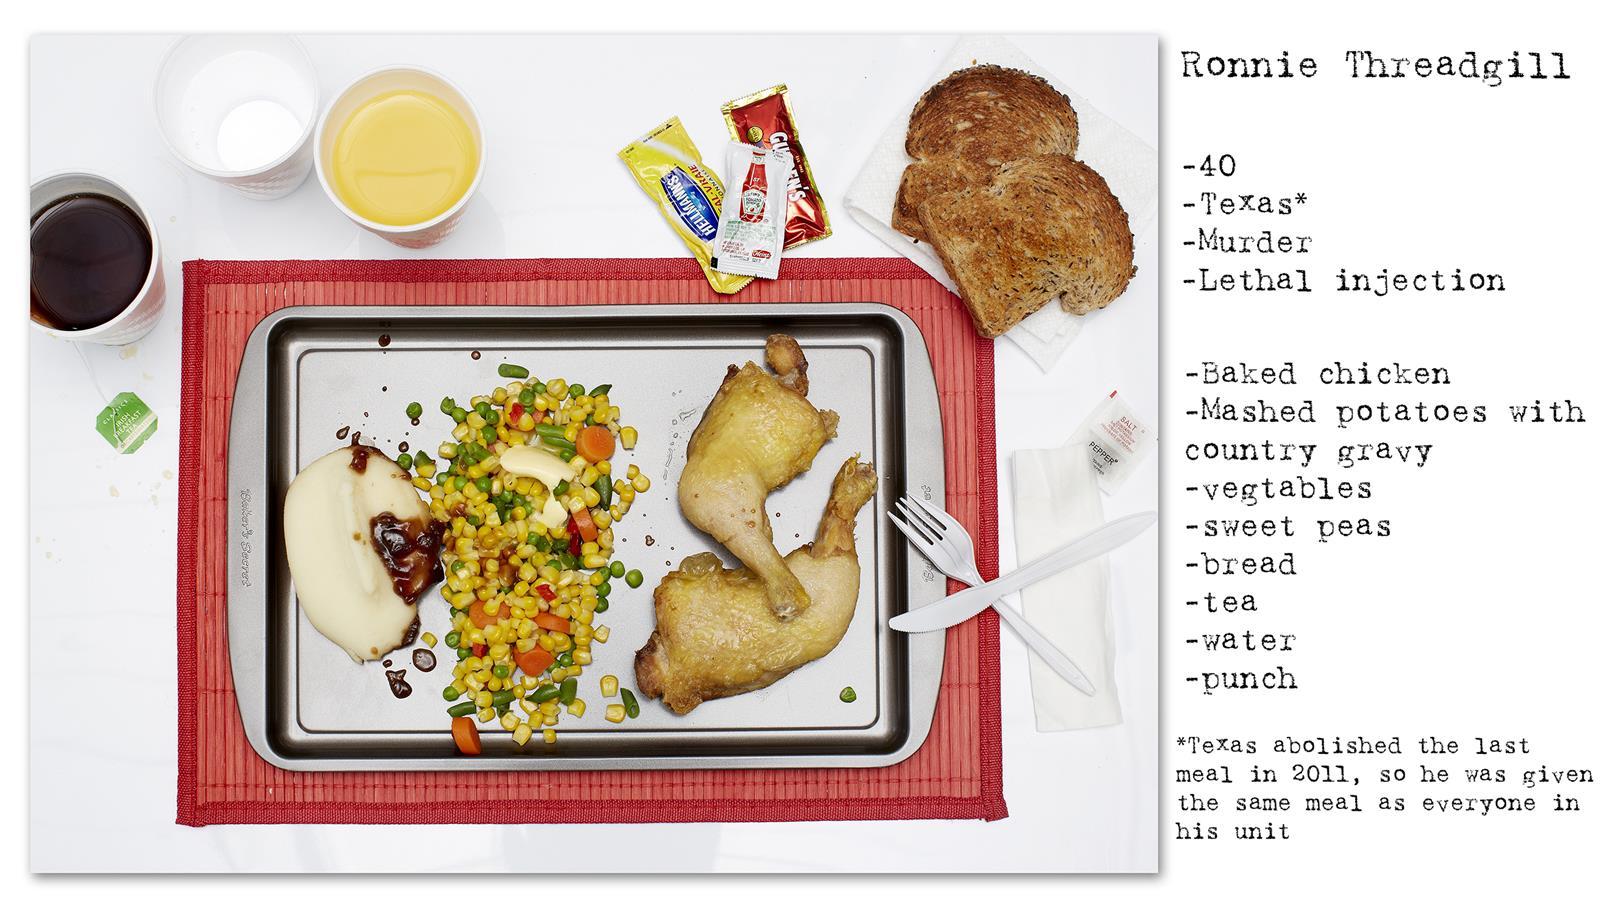 Death Row Prisoner's Last Meal (2)